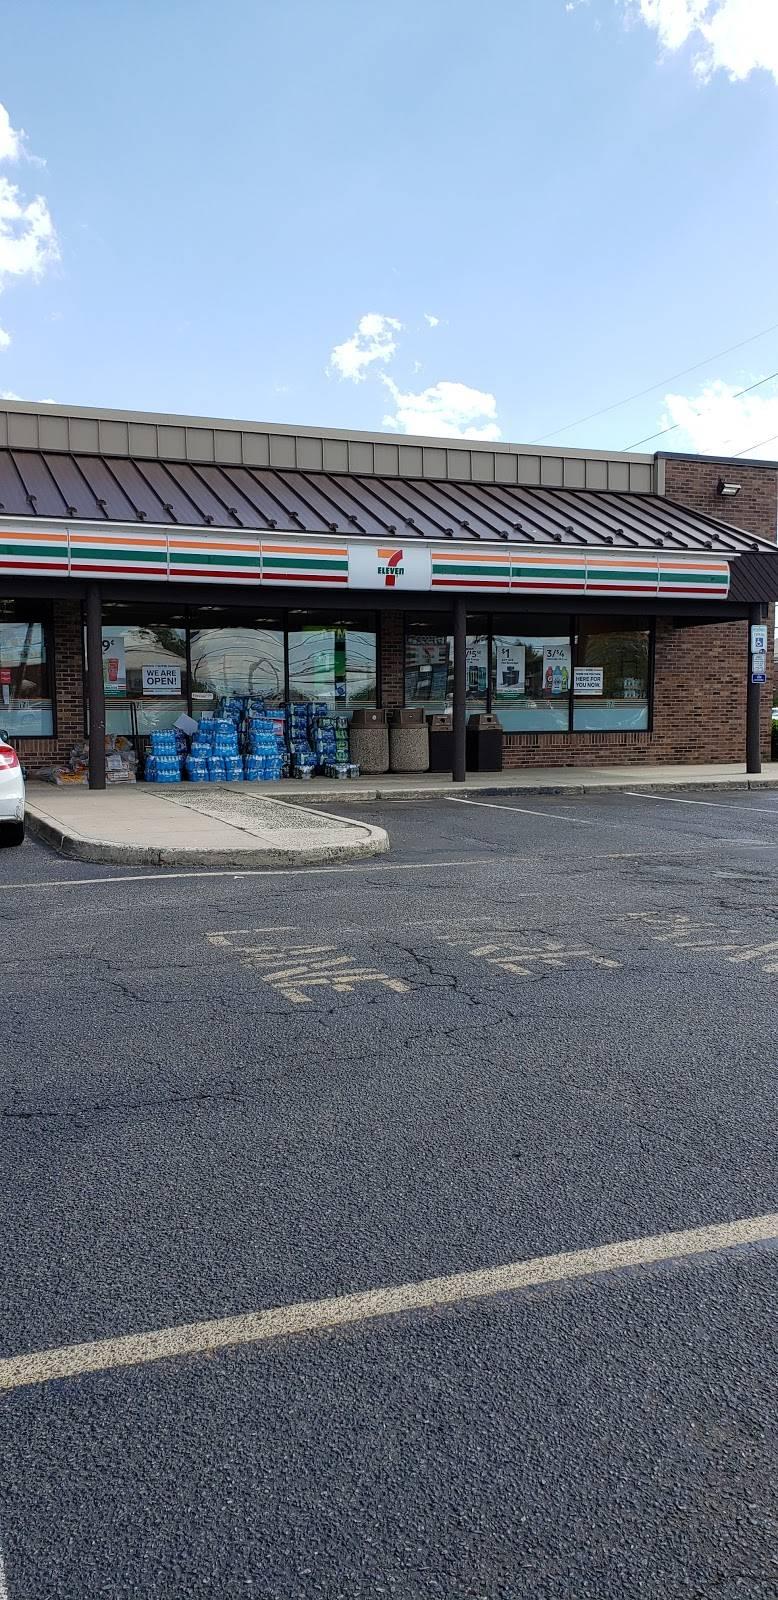 7-Eleven   bakery   375 Brick Blvd, Brick Township, NJ 08723, USA   7324771840 OR +1 732-477-1840